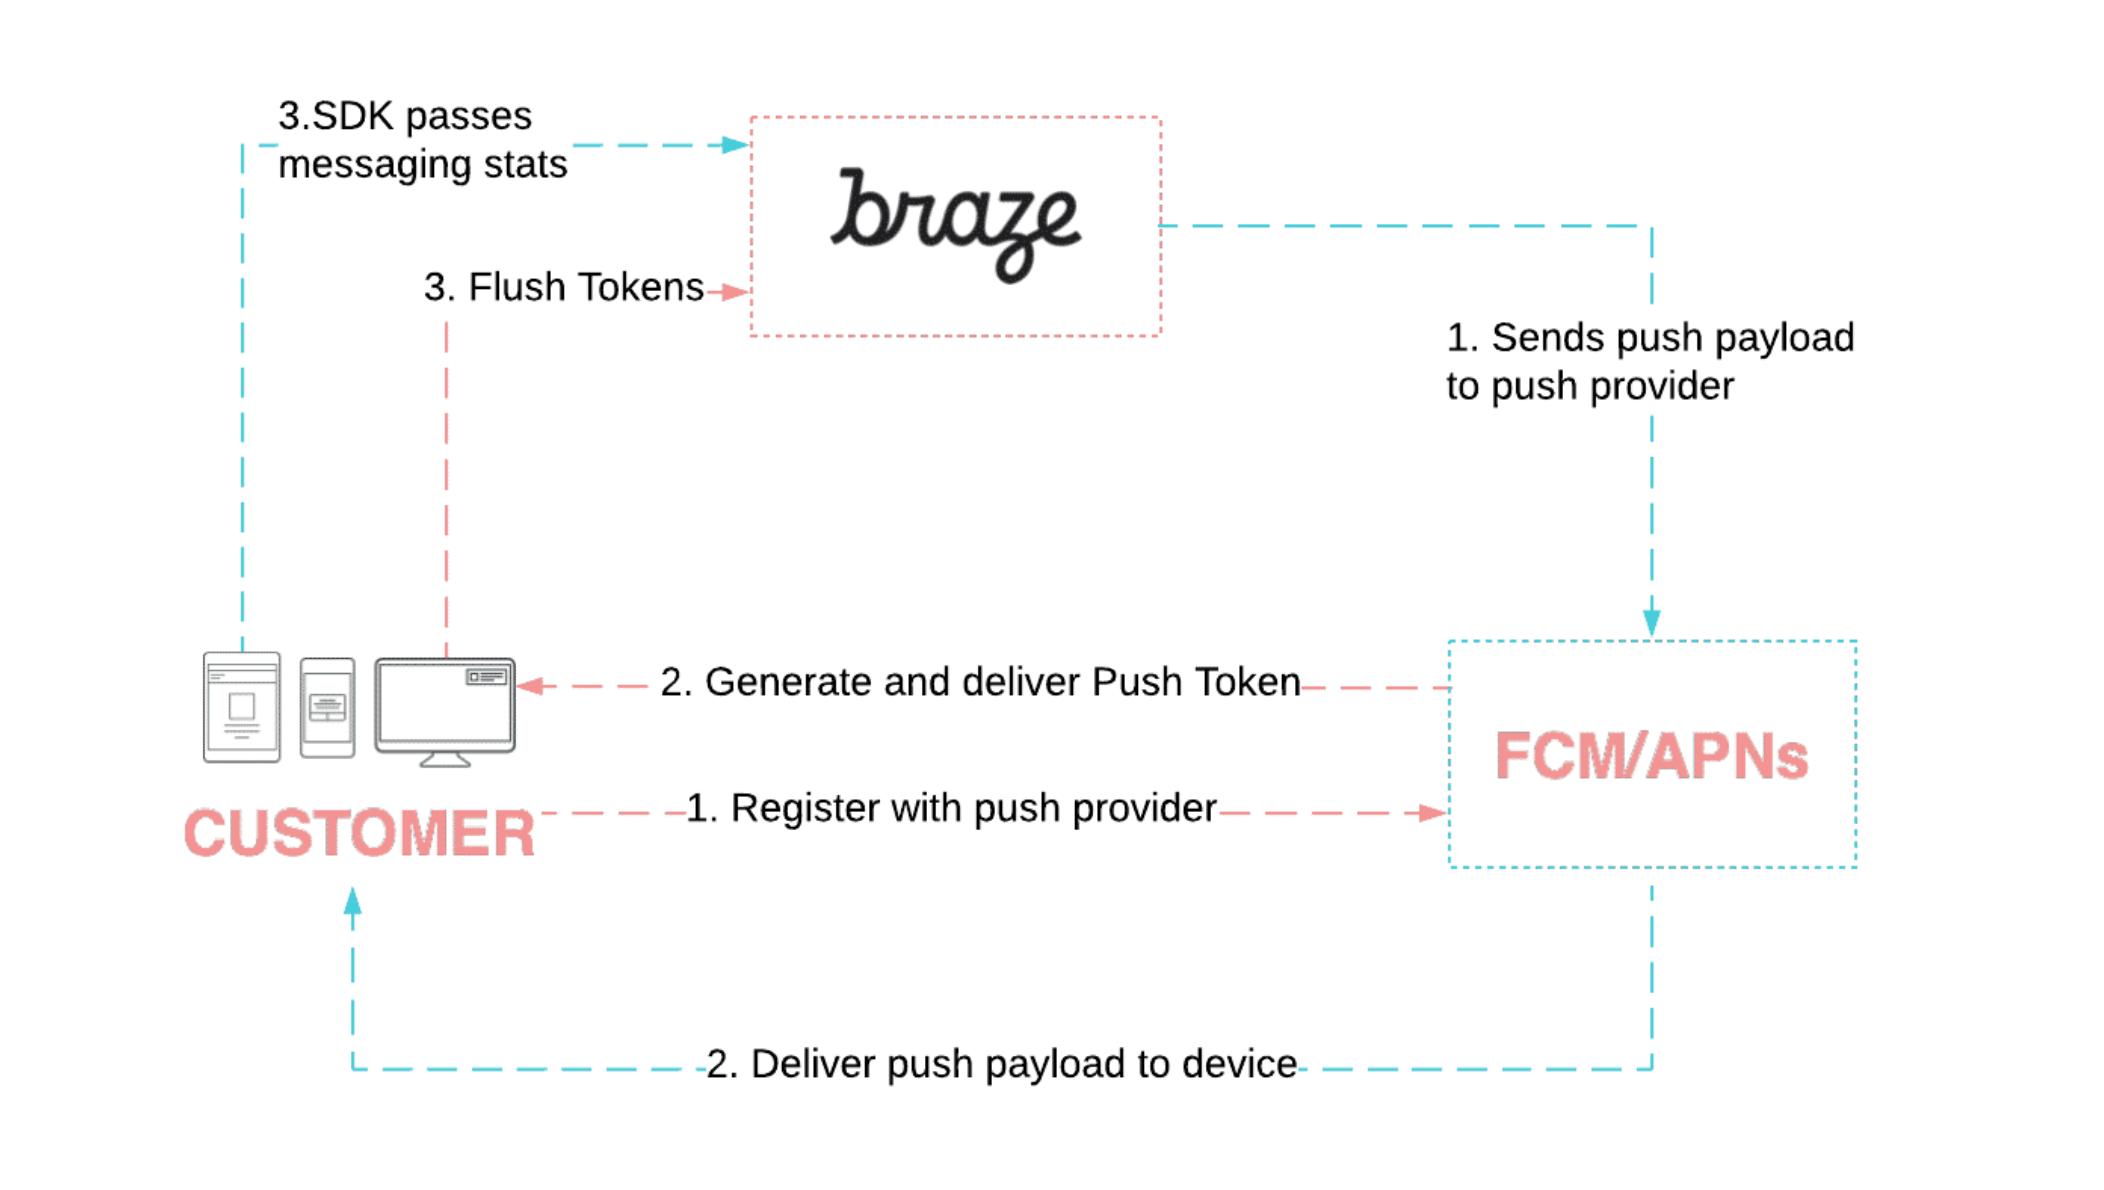 Braze Push Registration